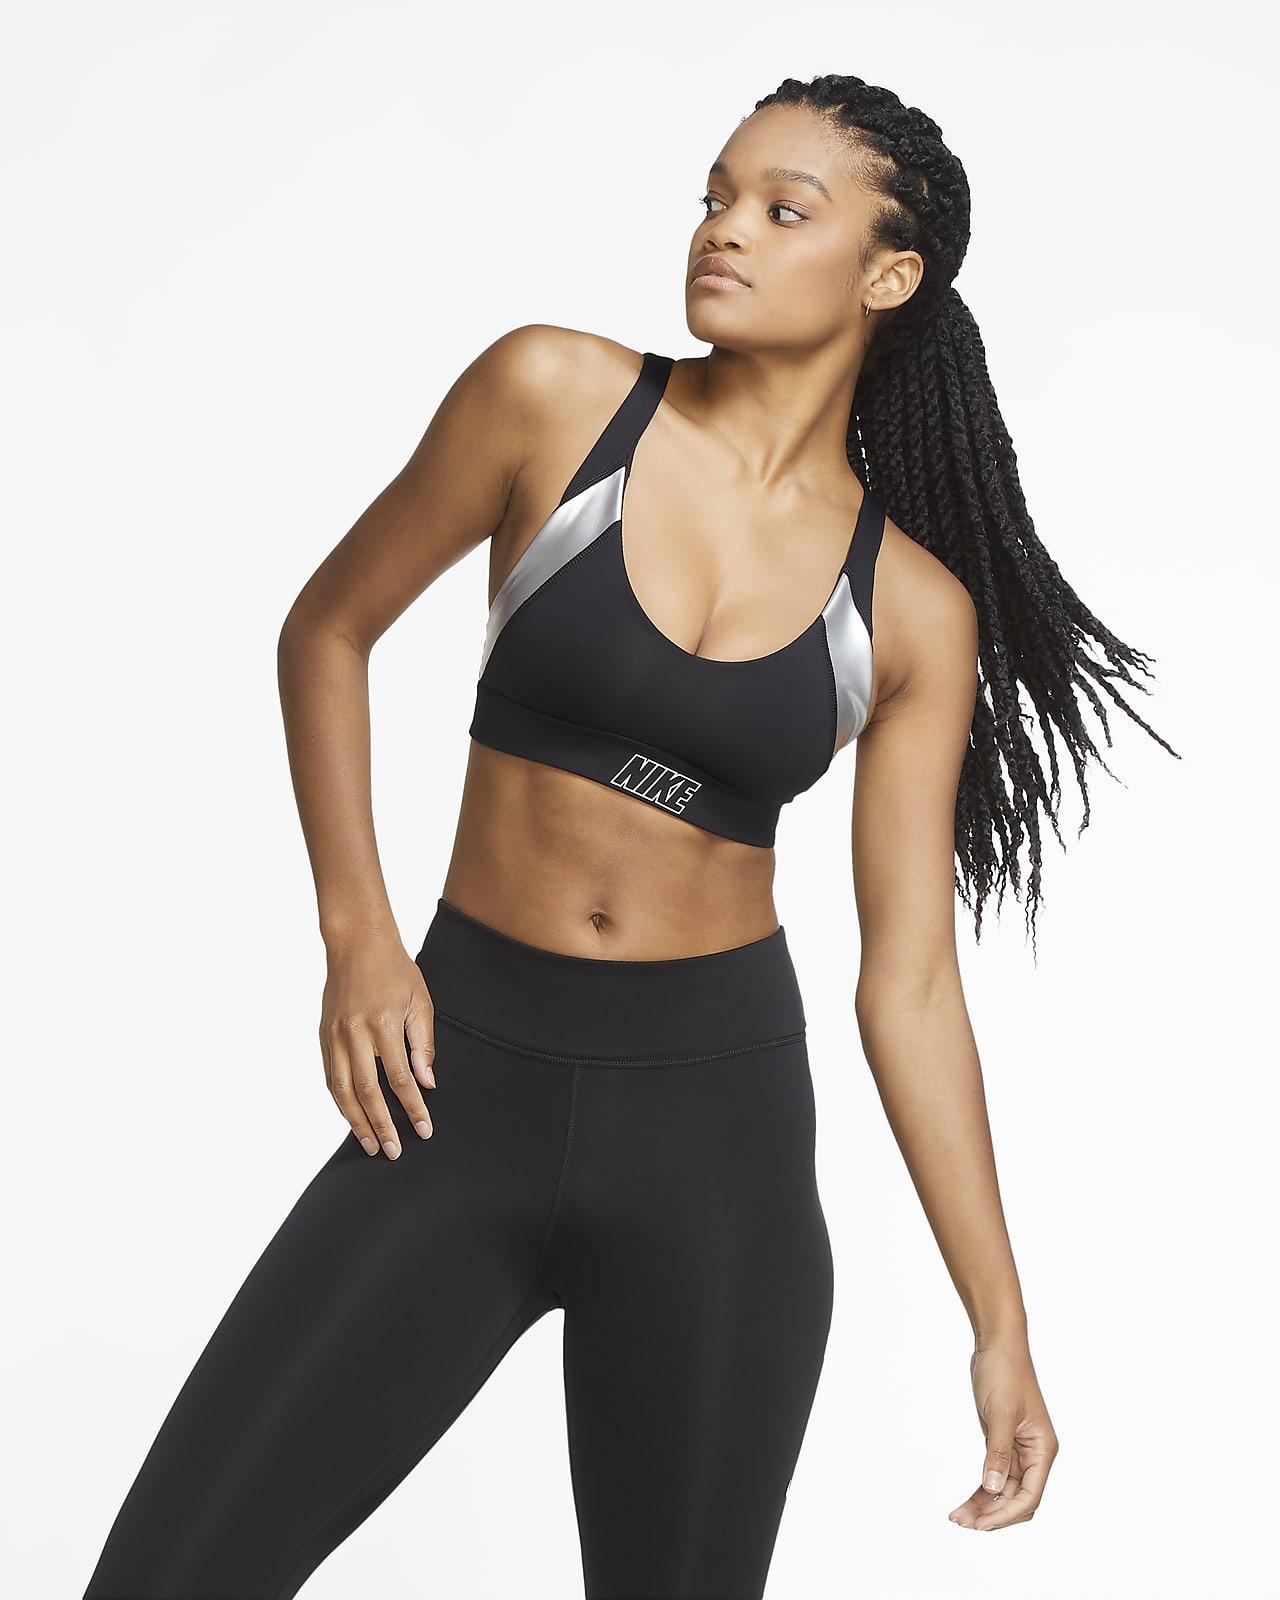 Nike Indy Women's Light-Support Metallic Sports Bra